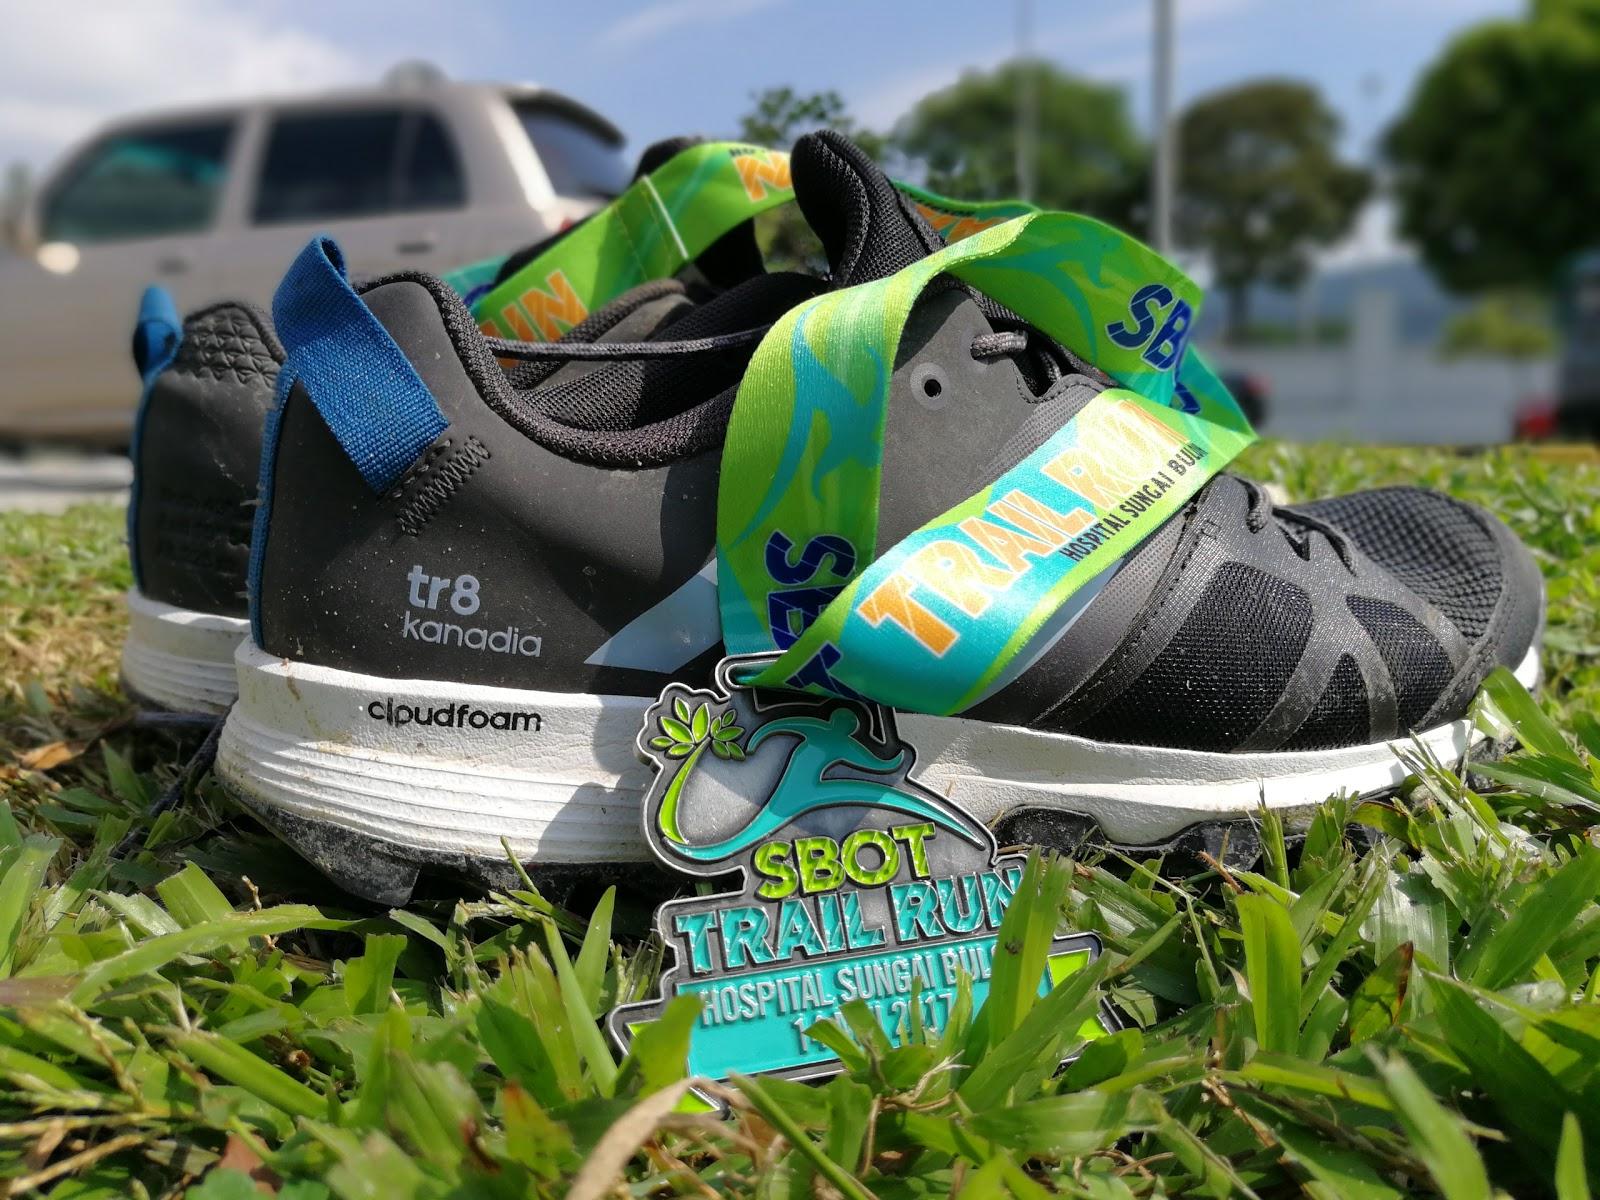 SBOT Trail Run 2017